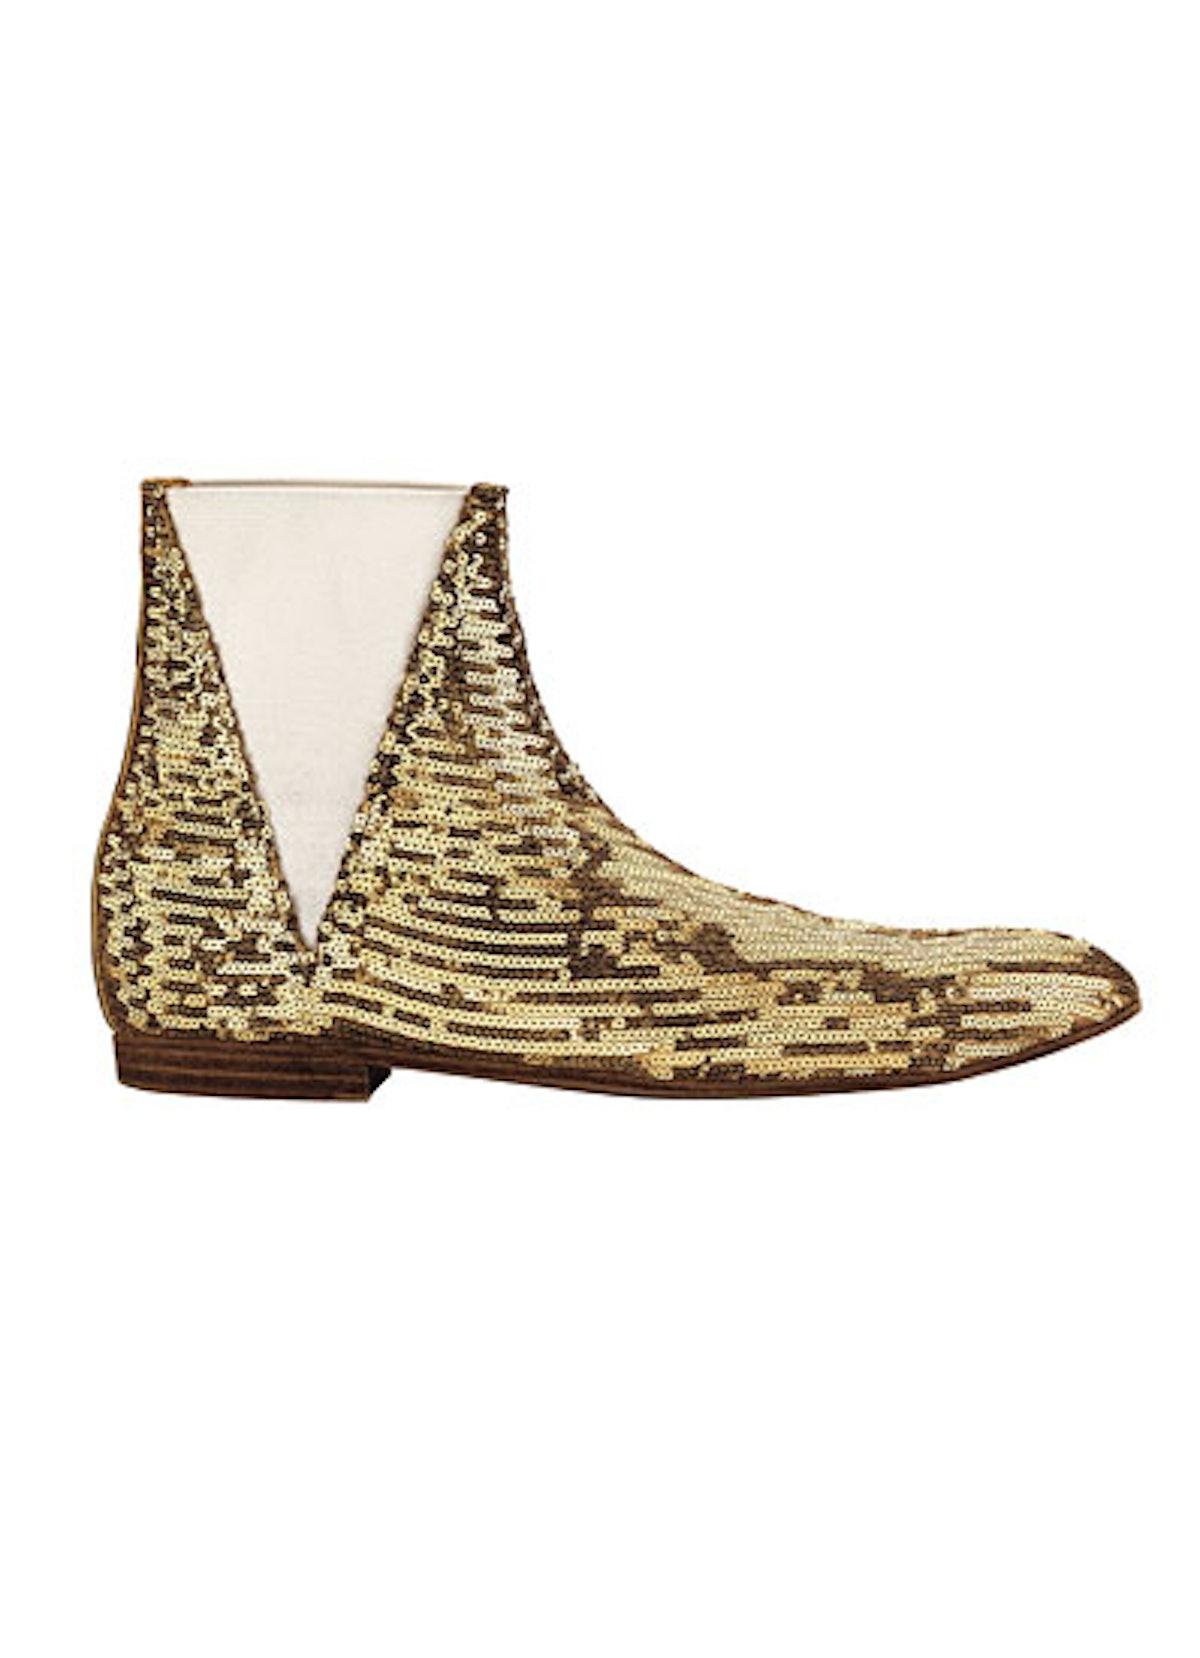 fass-gold-fashion-trend-07-v.jpg